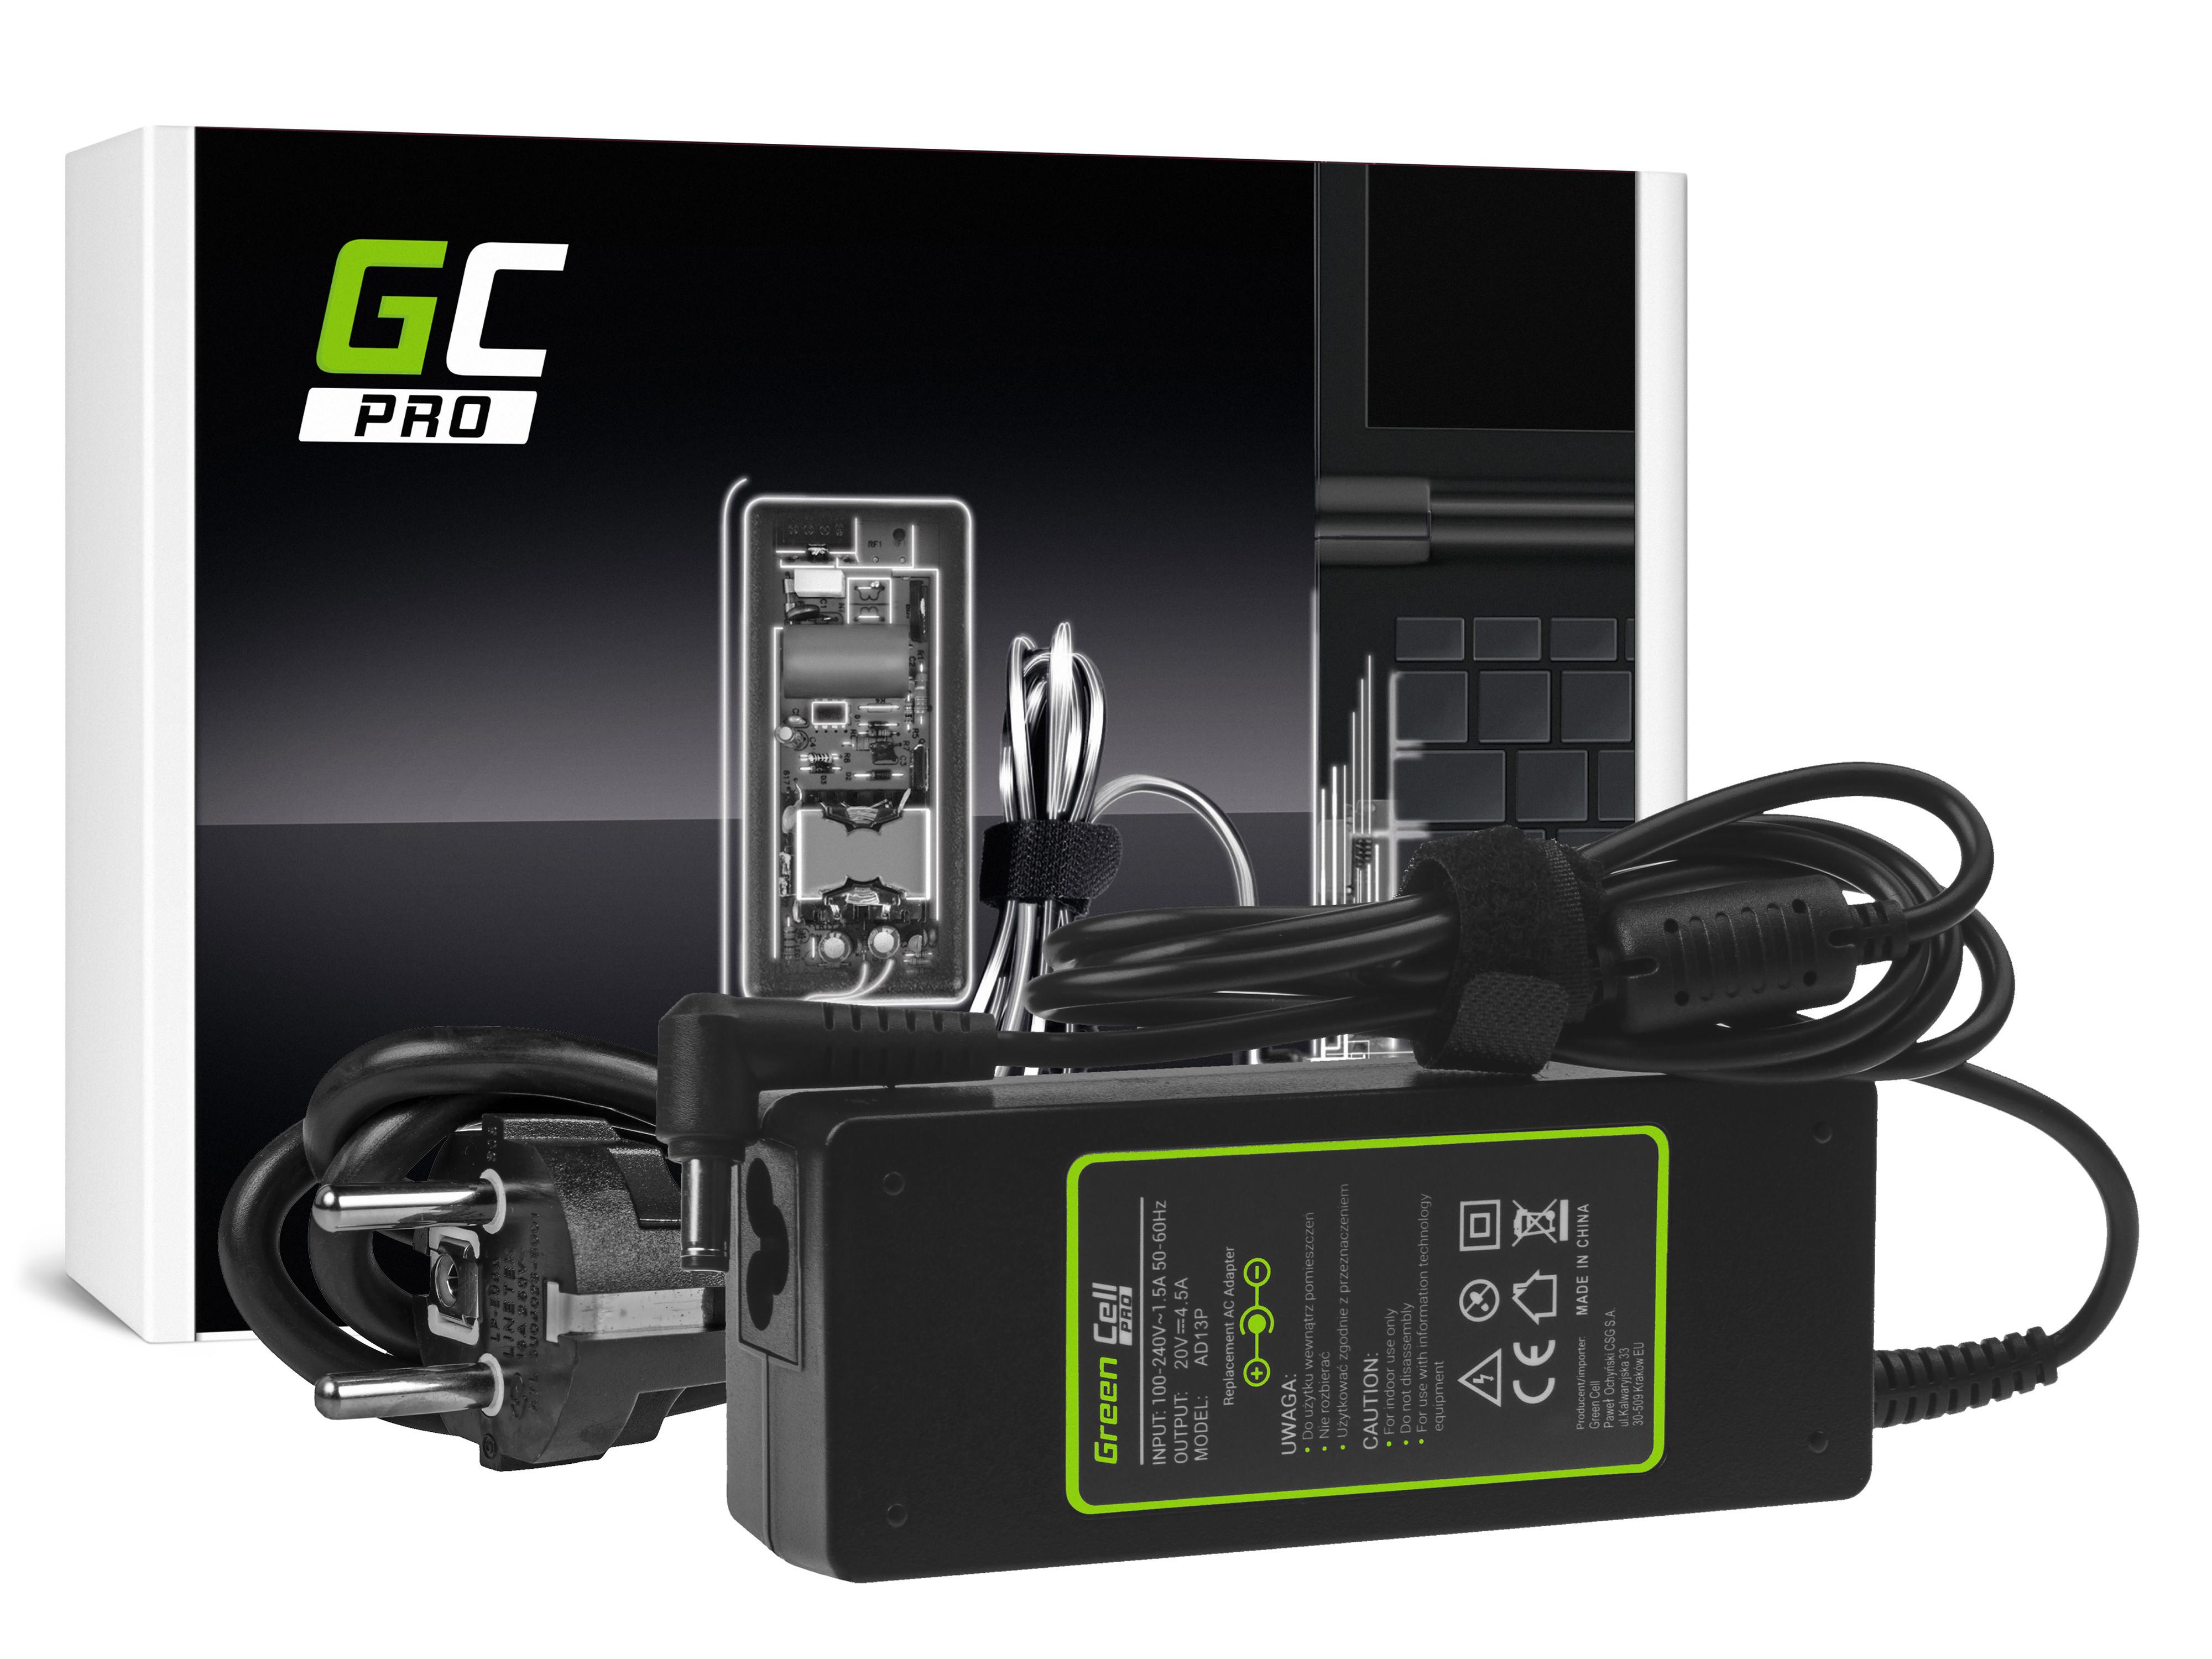 Green Cell AD13P Adaptér Nabíječka Lenovo B570 G550 G570 G575 G770 G780 G580 G585 IdeaPad P580 Z510 Z580 Z585 20V 4.5A 90W